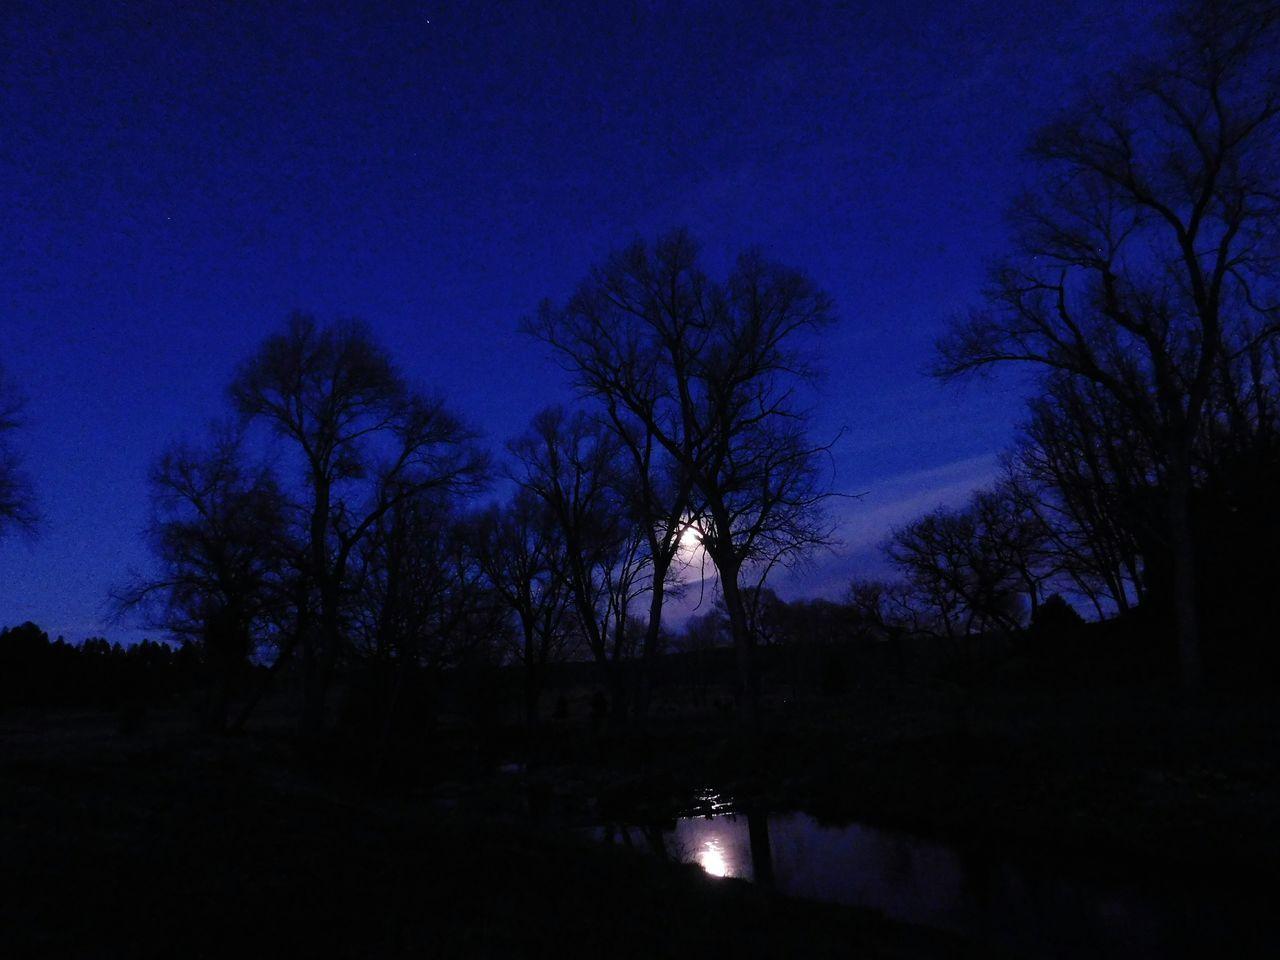 Tree Sky Silhouette Dramatic Sky Newmexicomountain Newmexicoskys NewMexicoTRUE Newmexicophotography Newmexicosunsets Newmexicoskies Newmexicosunset Moon Shots Moon